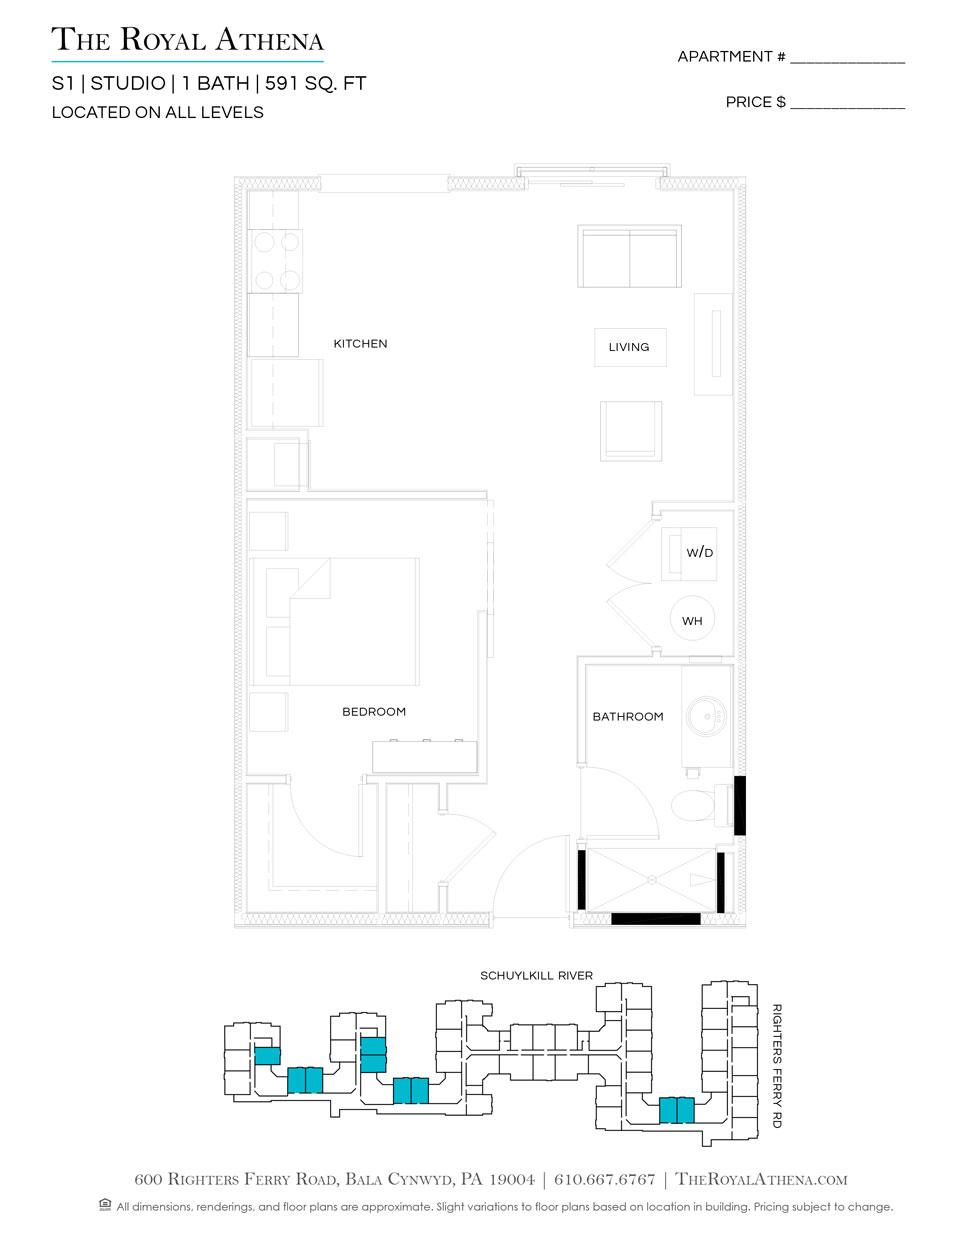 P0659218 s1 2 floorplan 1